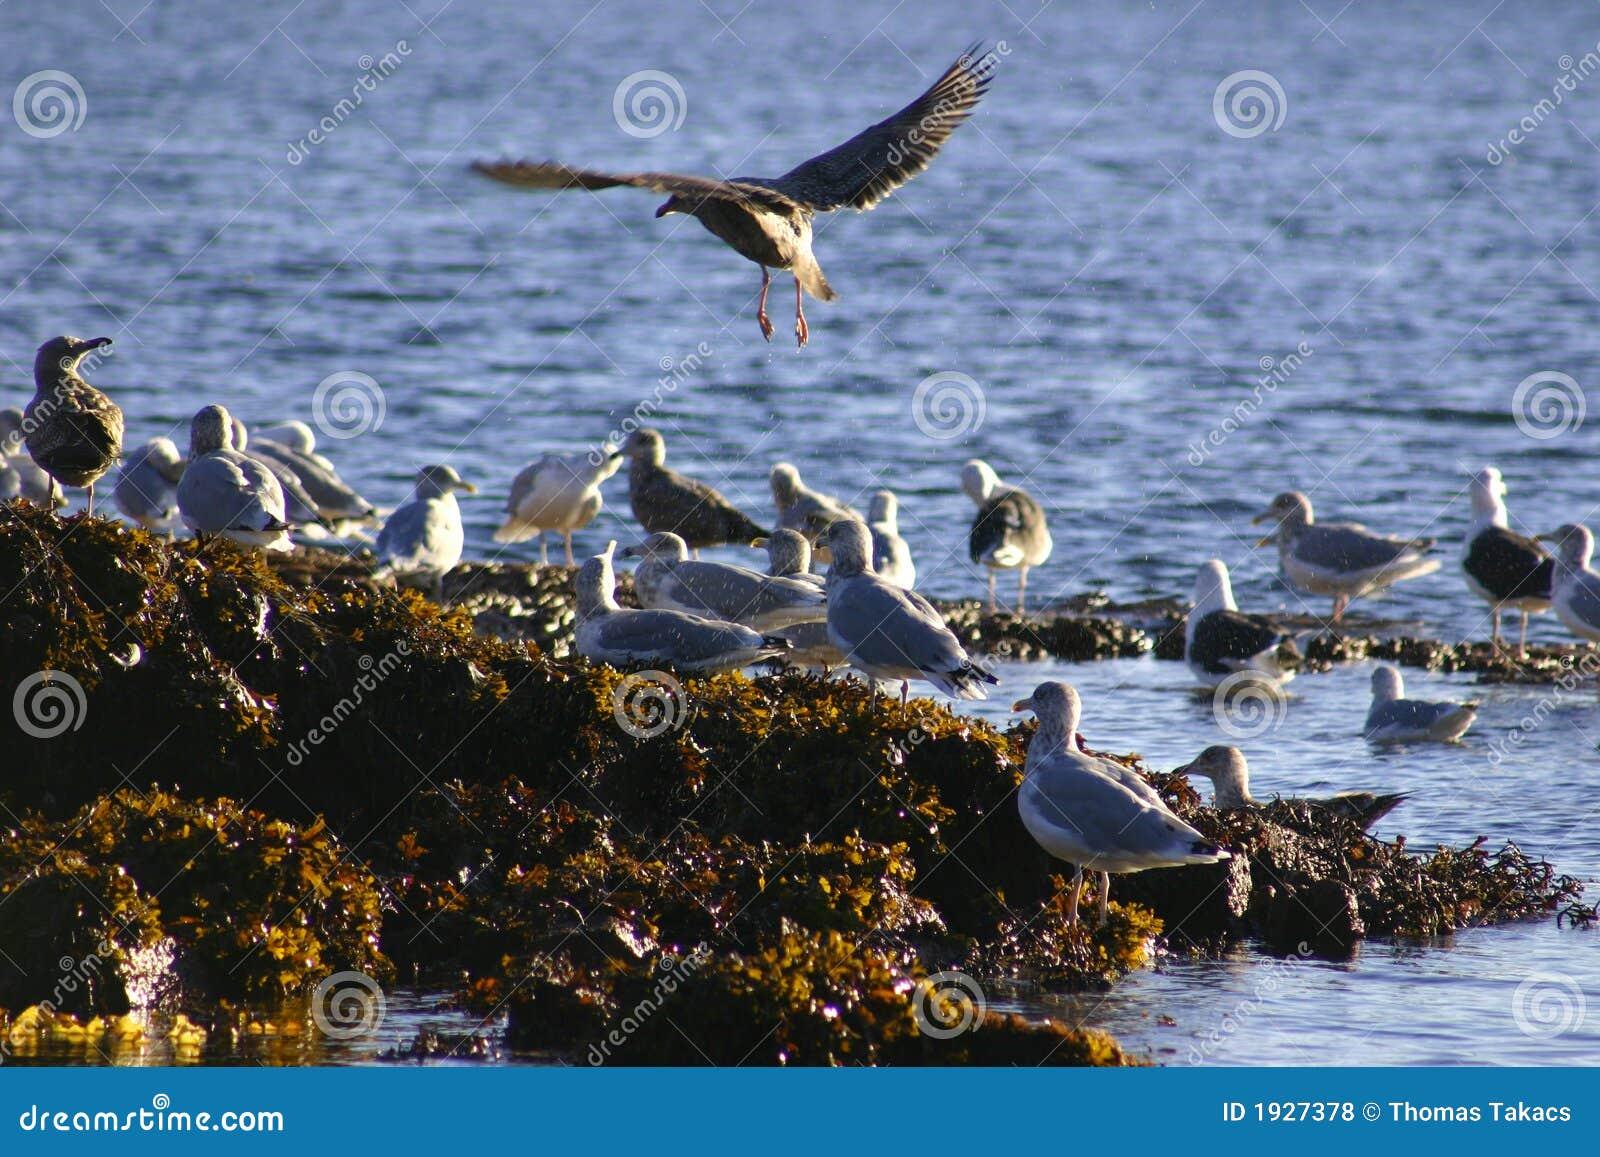 Sea Bird - Coming In For Landing